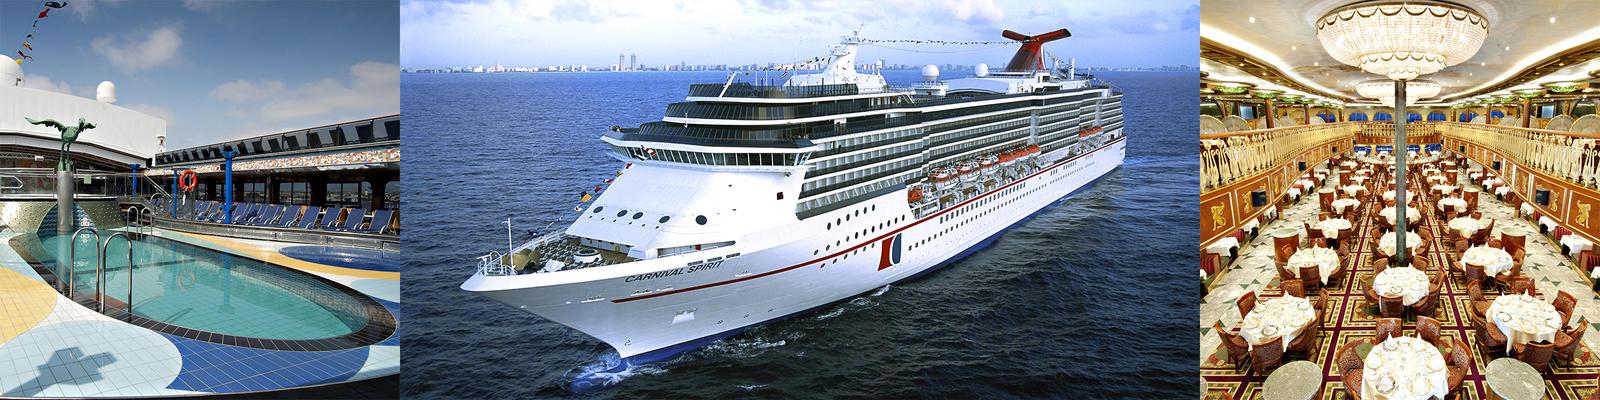 Carnival Spirit Cruise Ship Review Photos Amp Departure